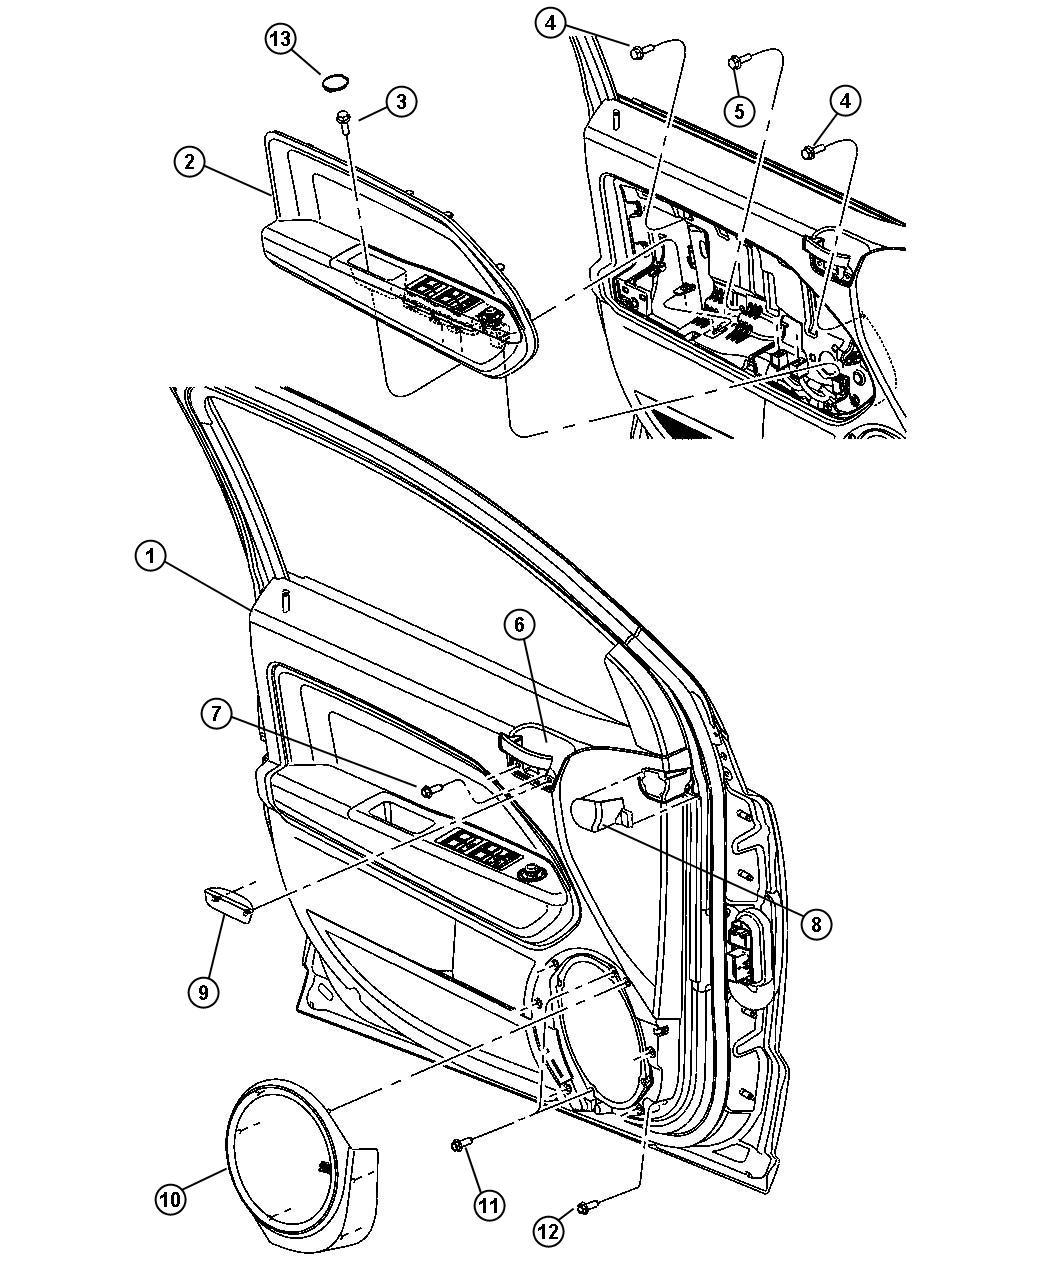 2010 Dodge Caliber Plug. Door trim panel. Right. [dv], [v3